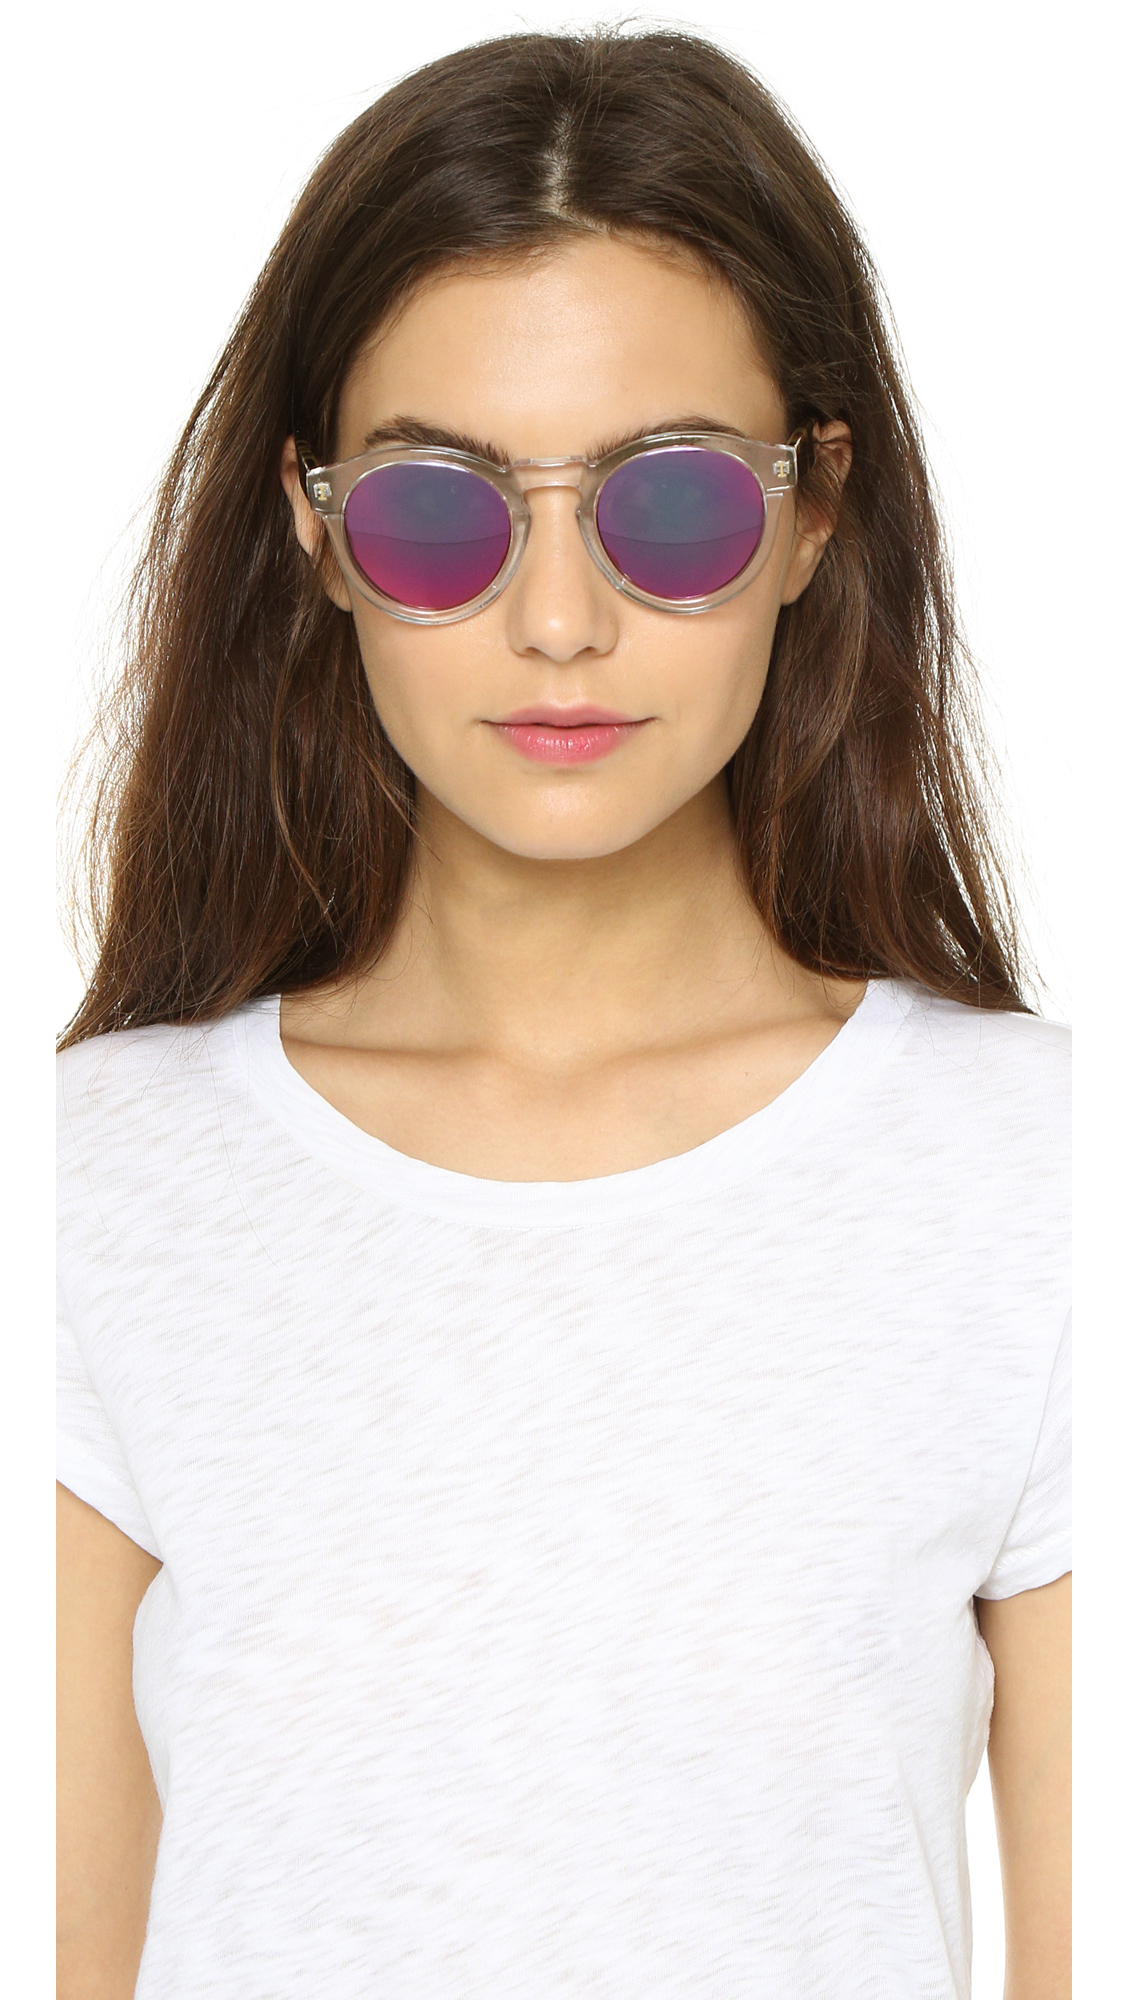 cb1ea29e1f4 Illesteva Leonard Mirrored Sunglasses - Clear   Tortoise pink in ...